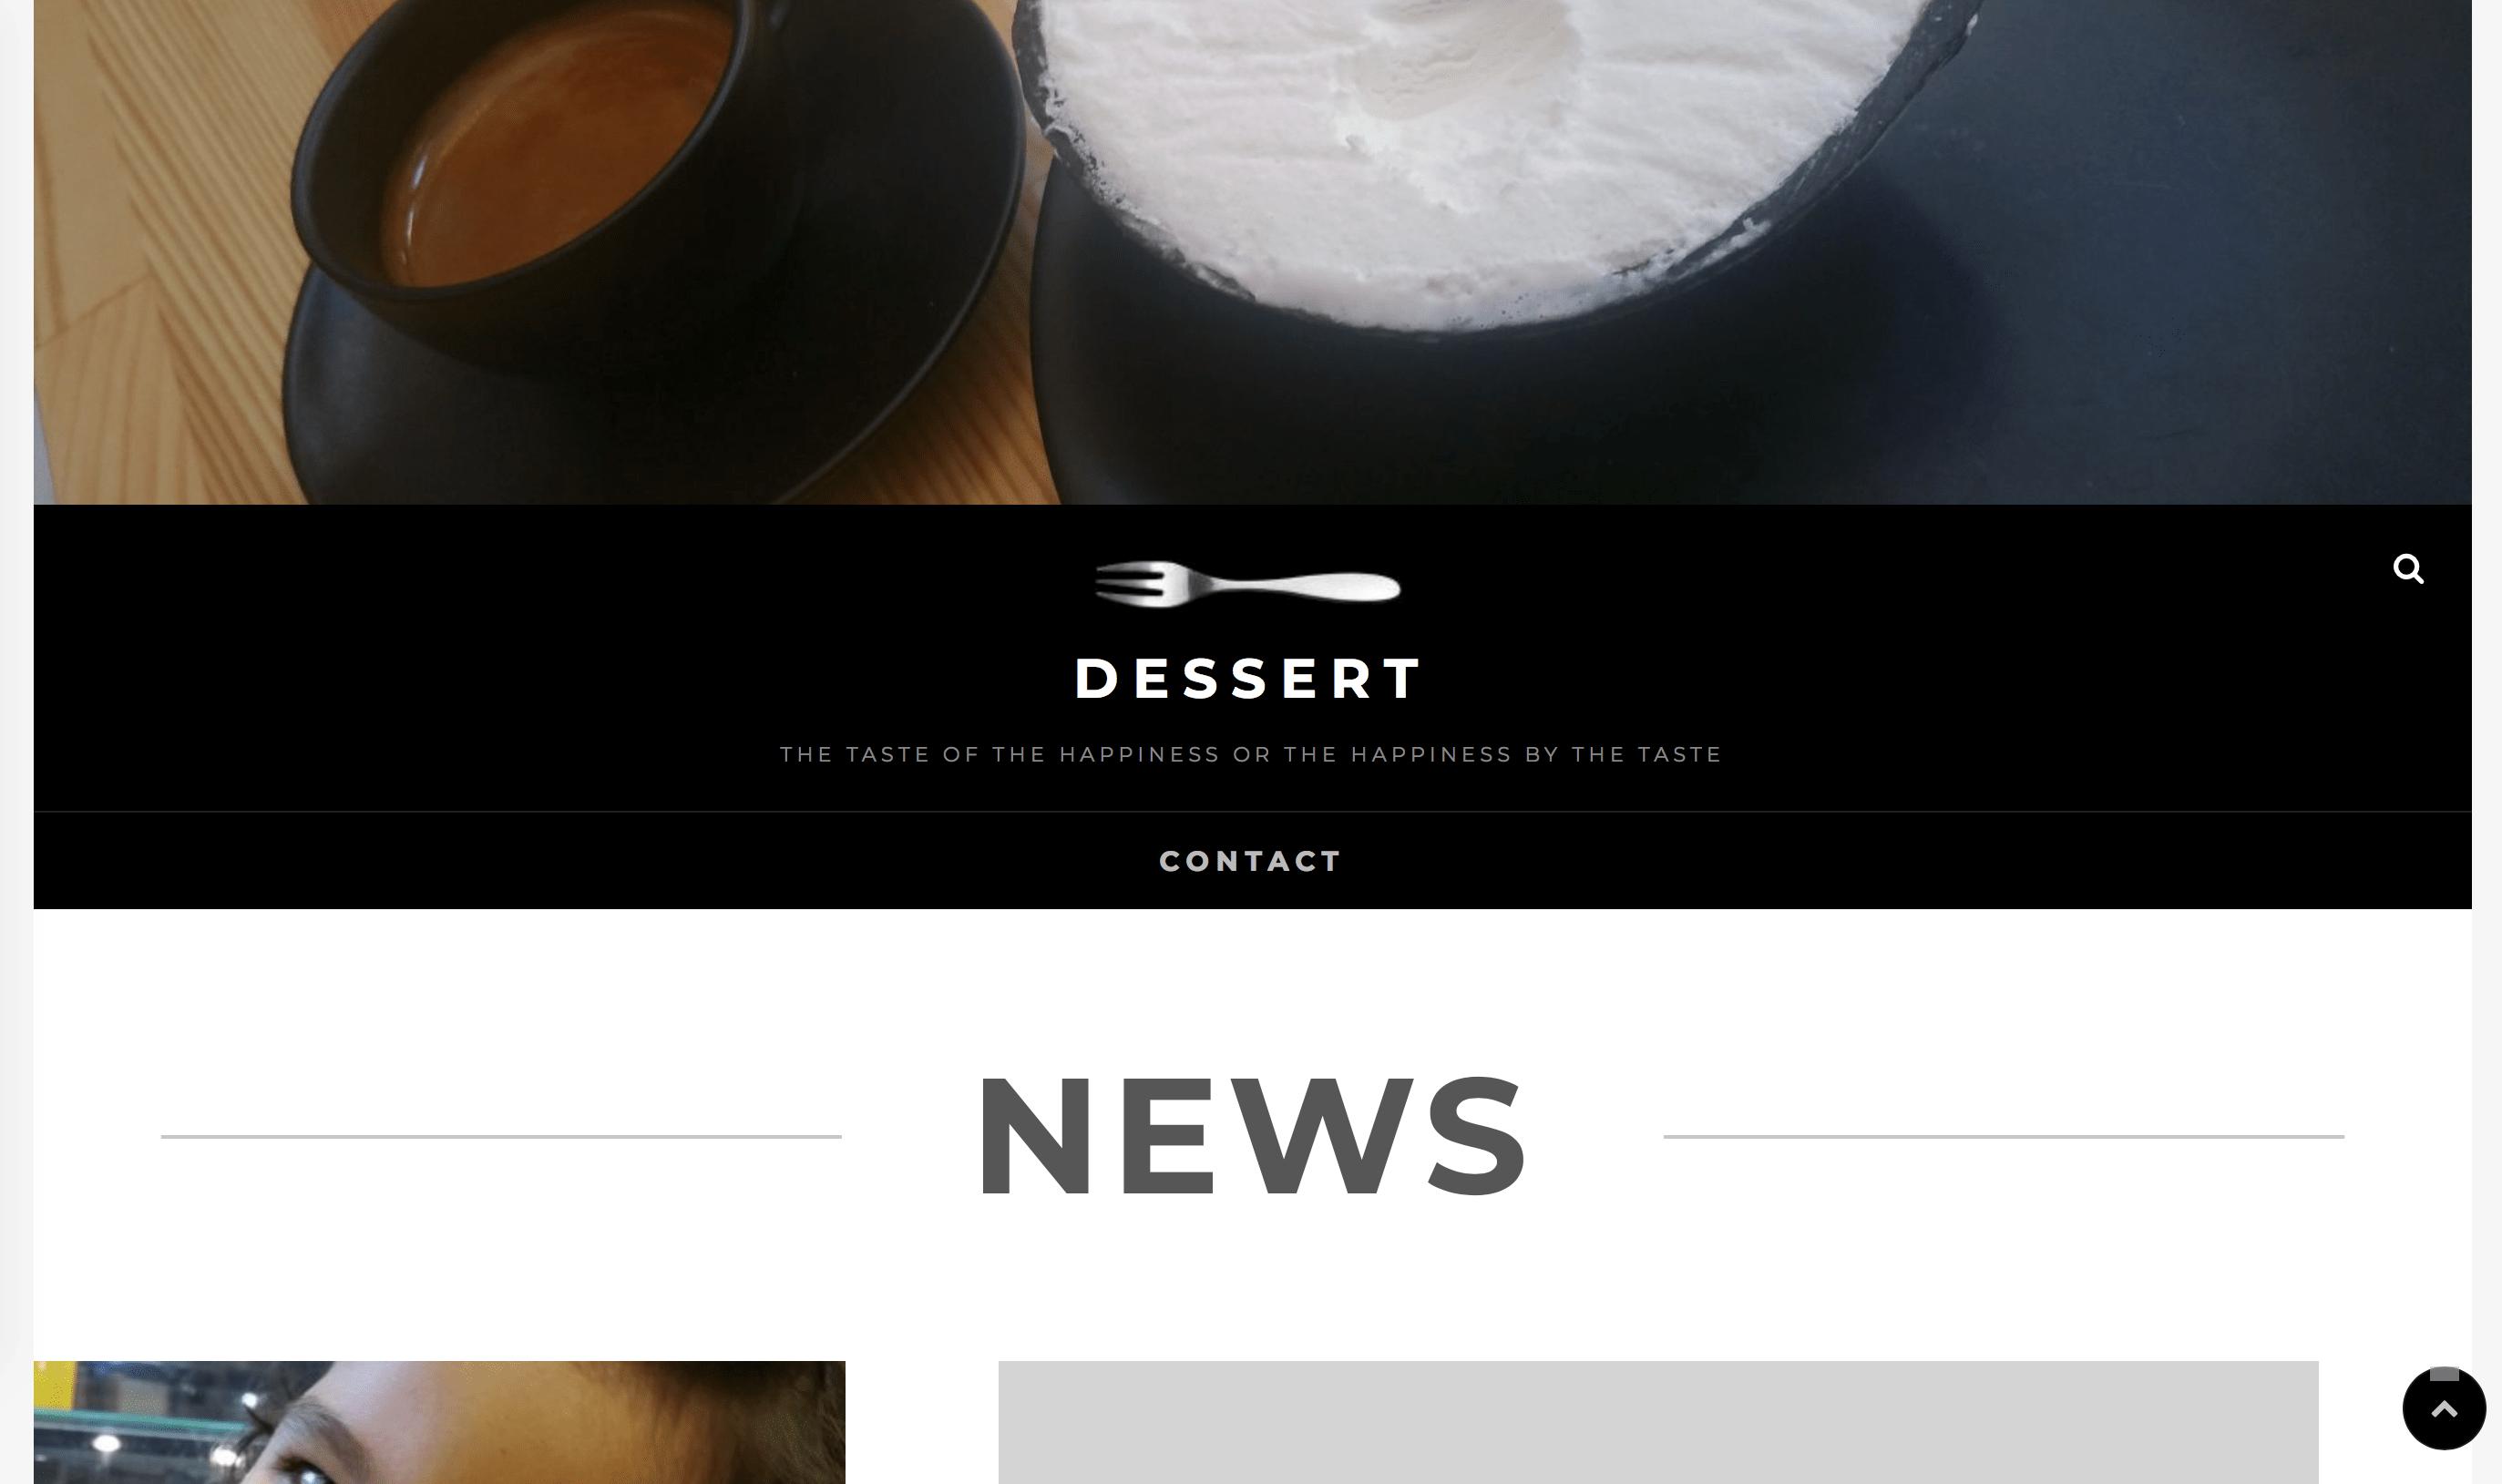 Concept dessert